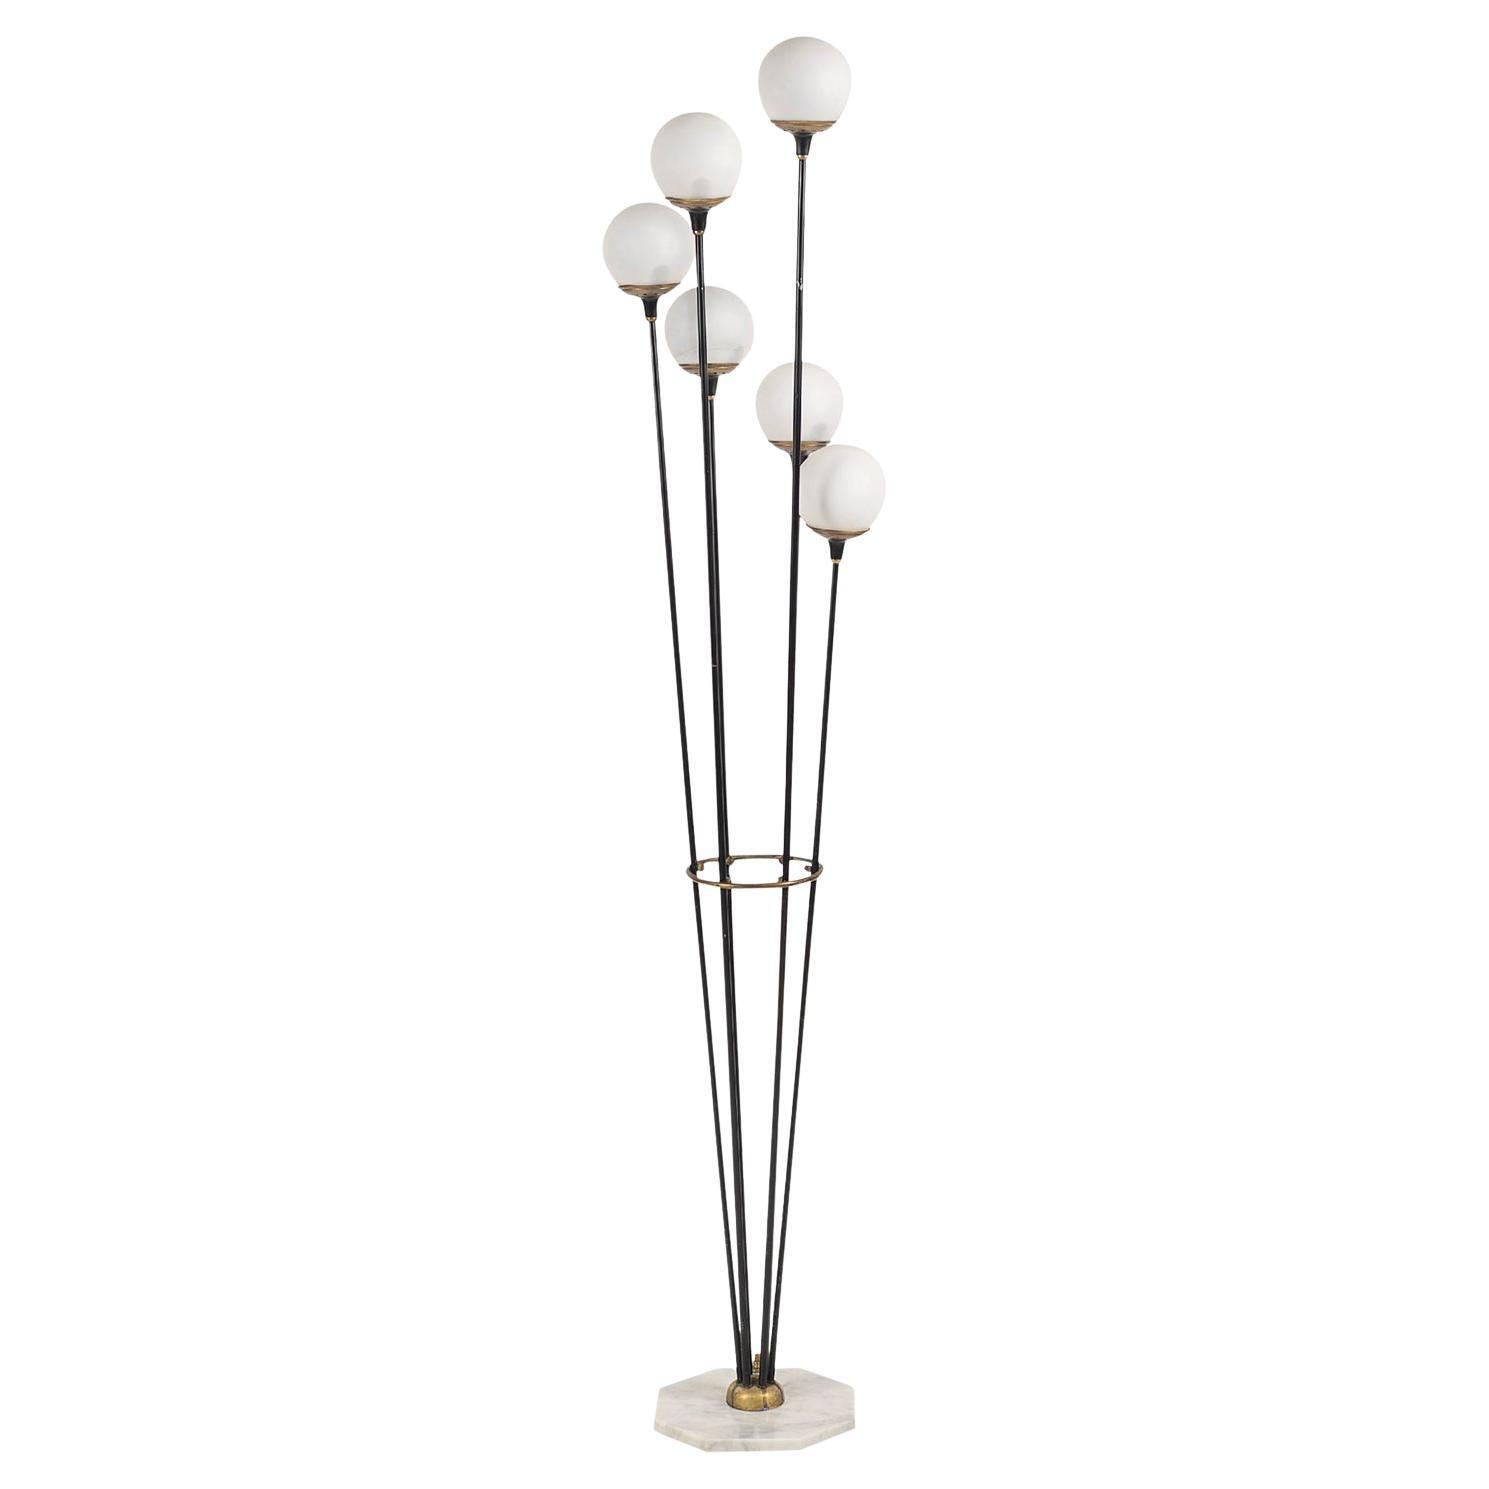 20th Century Italian Alberello Marble, Opaline Glass Floor Lamp by Stilnovo